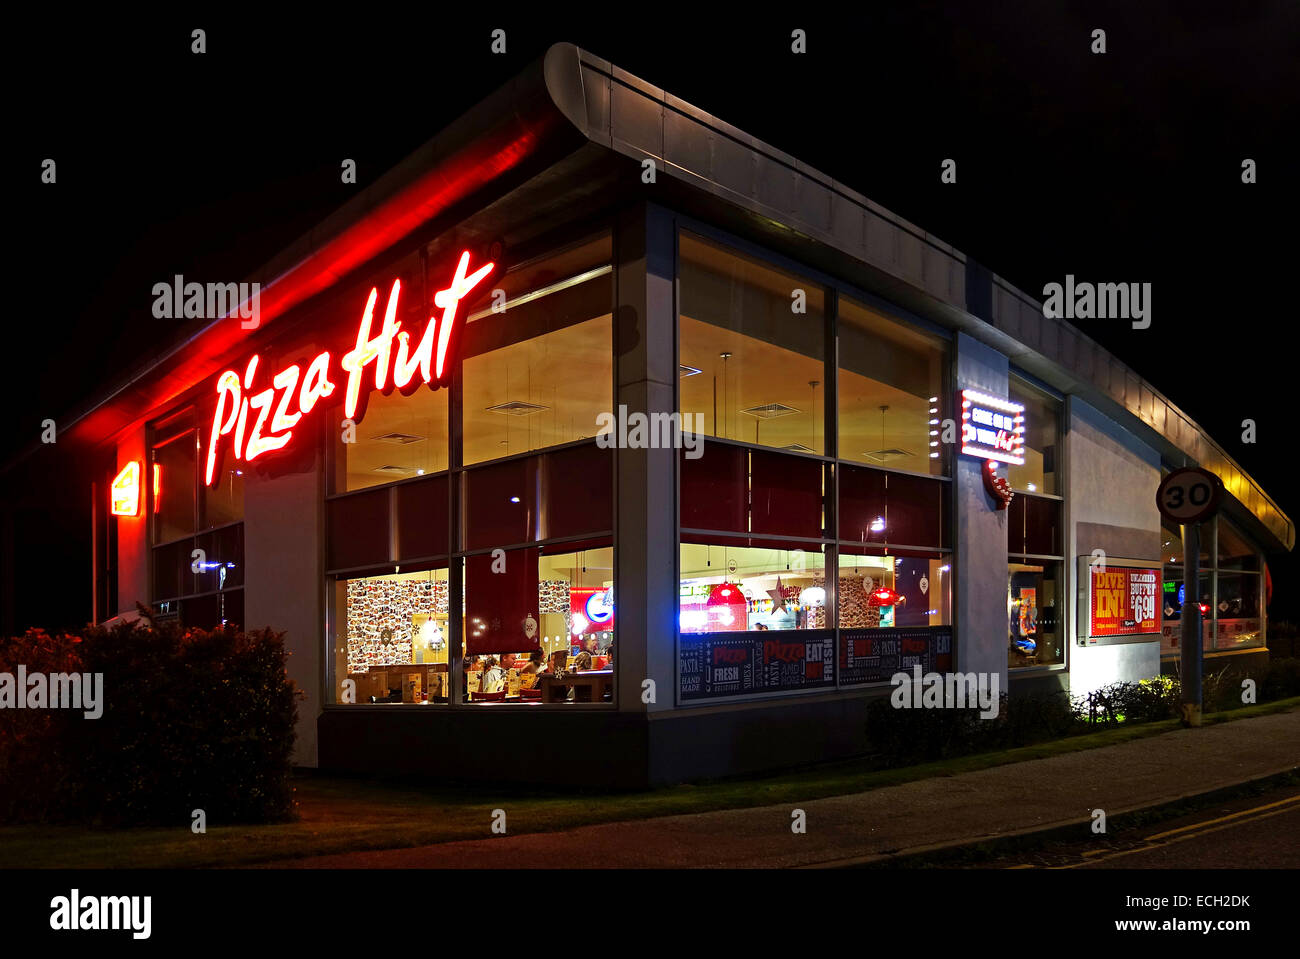 Pizza hut restaurant at night stock photo royalty free - Restaurante pizza hut ...